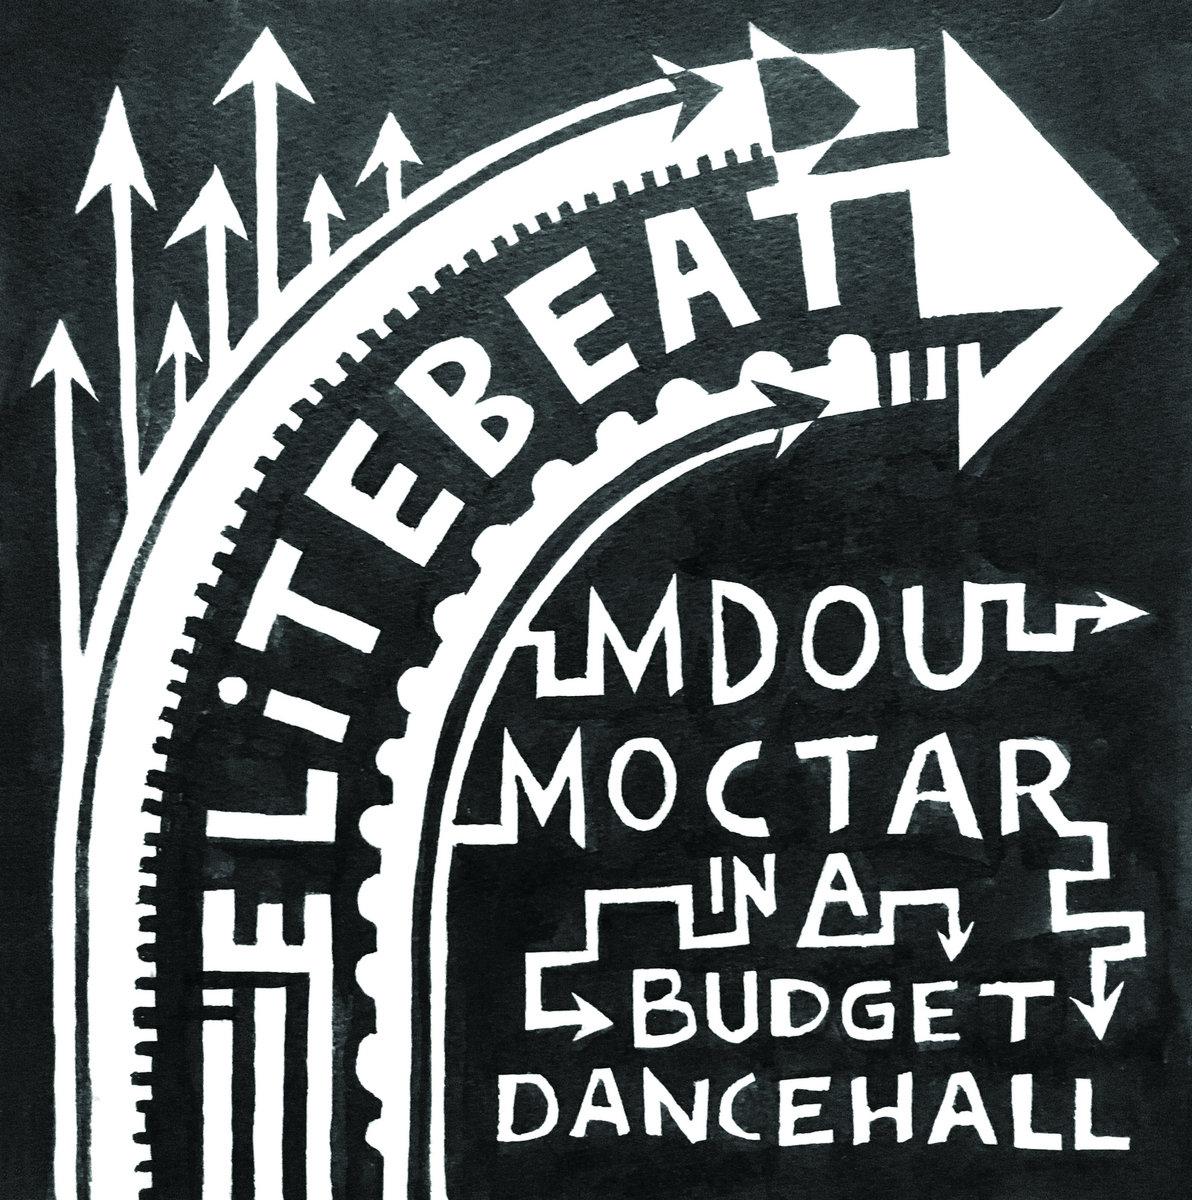 Mdou Moctar meets Elite Beat In a Budget Dancehall | ELITE BEAT